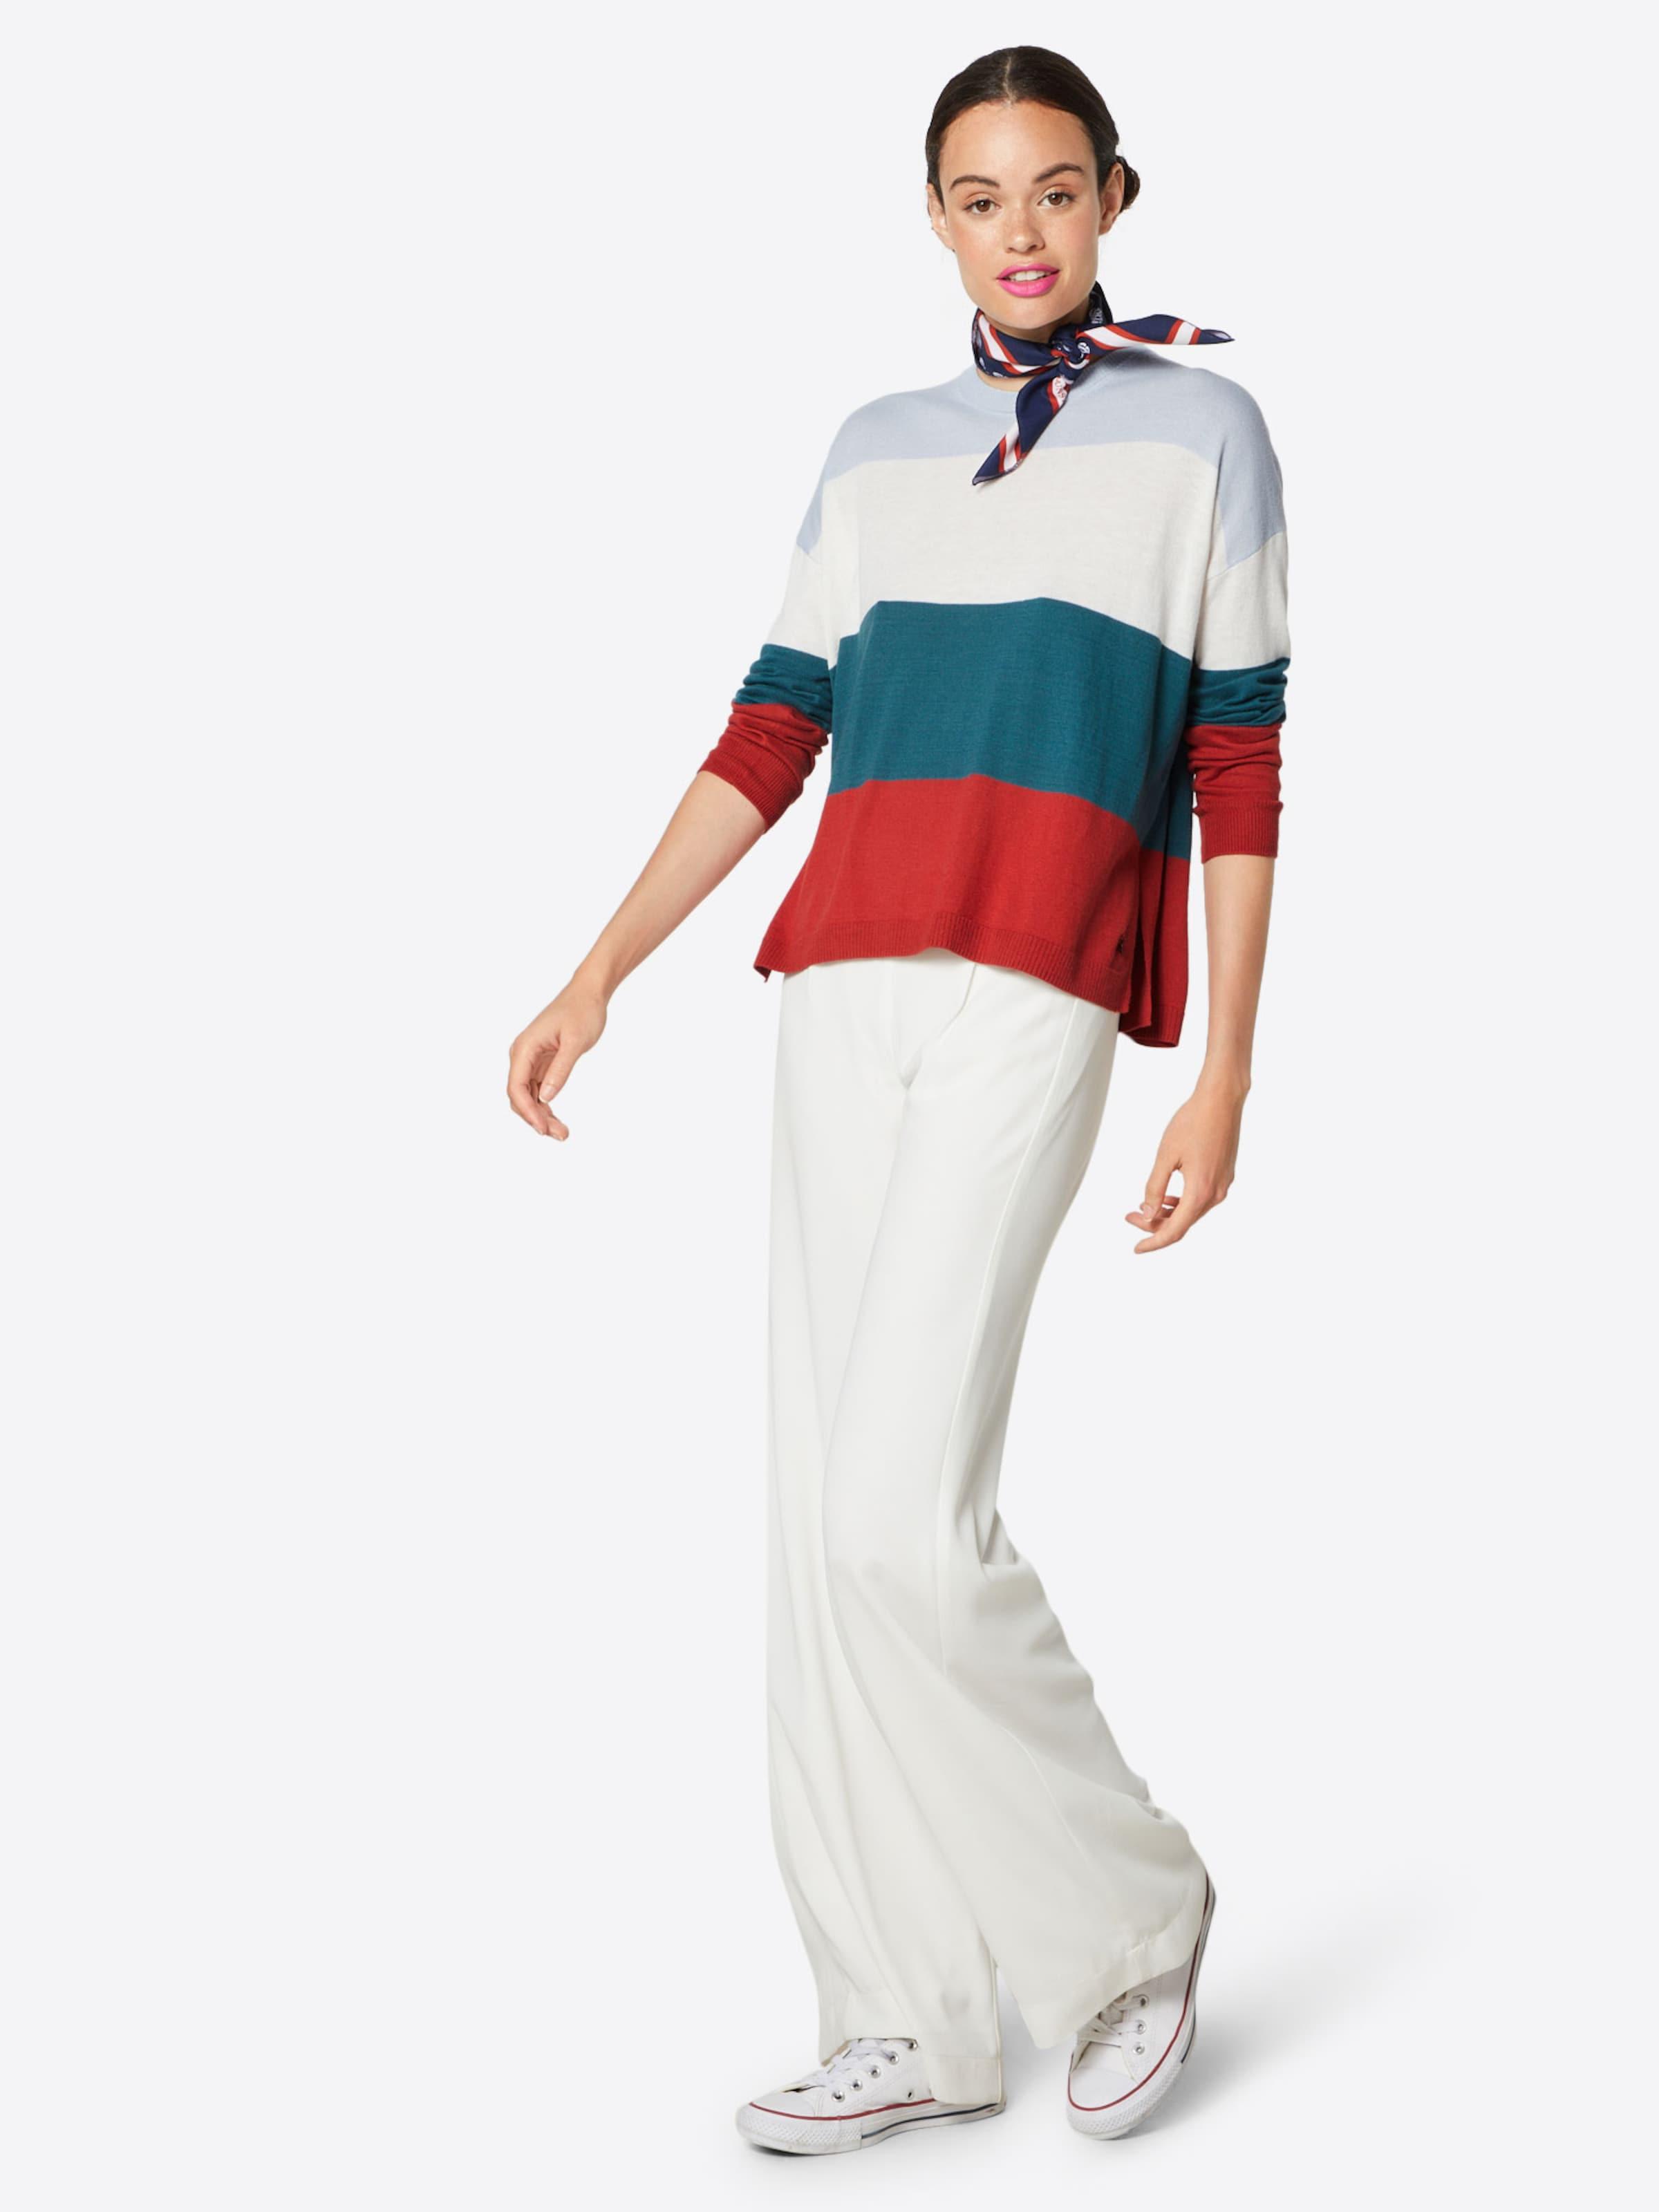 Pepe En Blanc Rouge Bleu ClairPétrole Pull 'mayas' Jeans over qjL4R53A